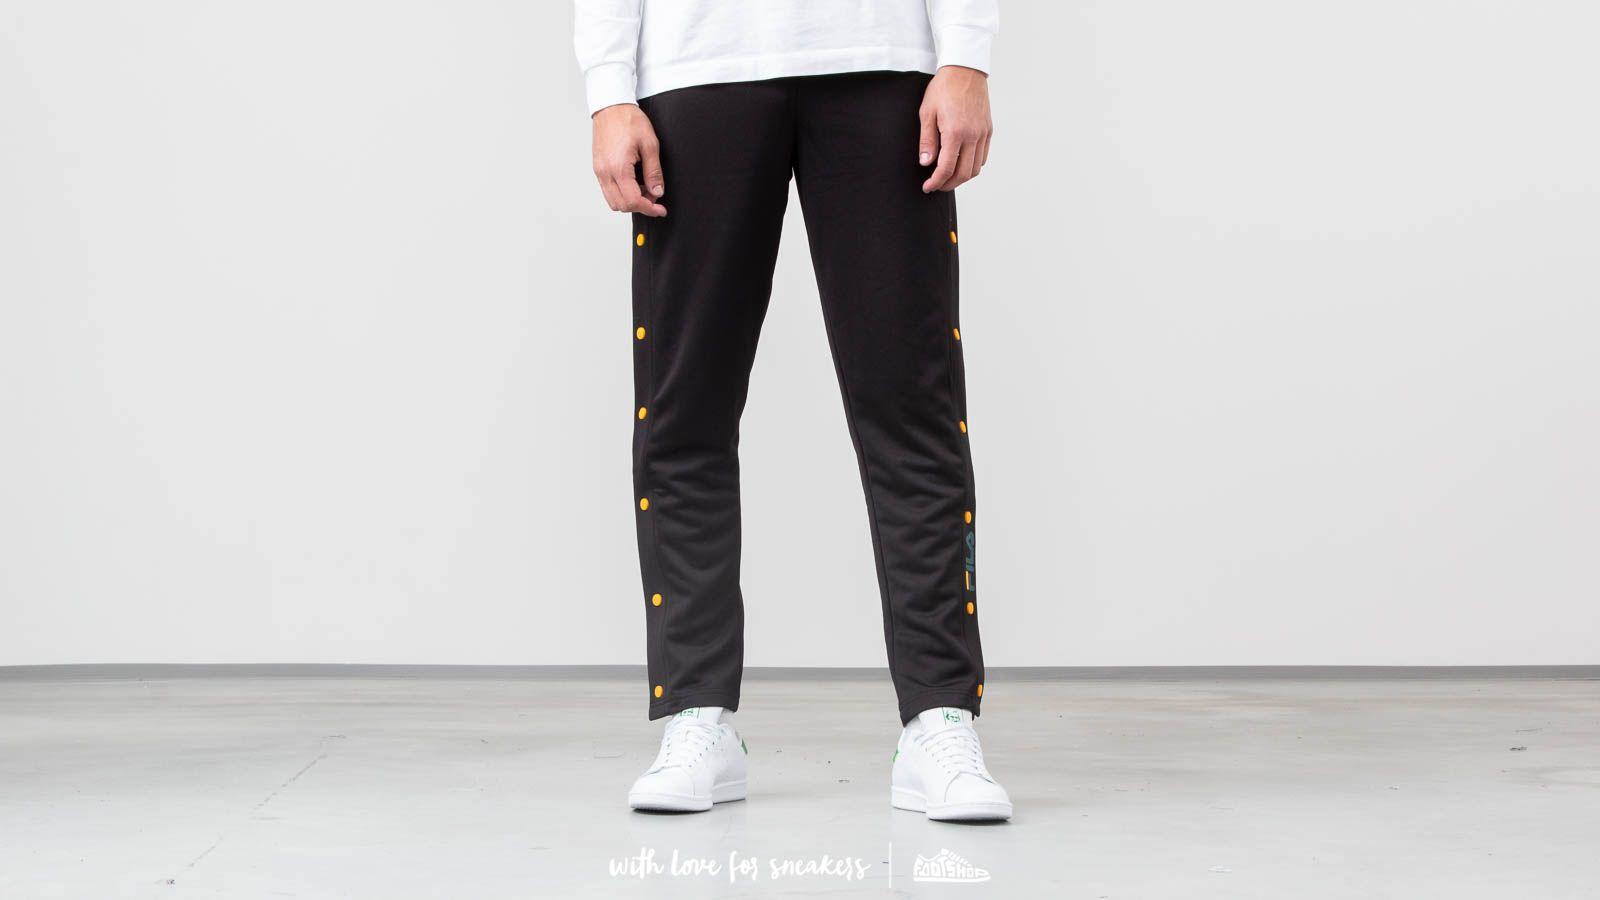 FILA Jay Full Tearaway Pants Black za skvelú cenu 53 € kúpite na Footshop.sk